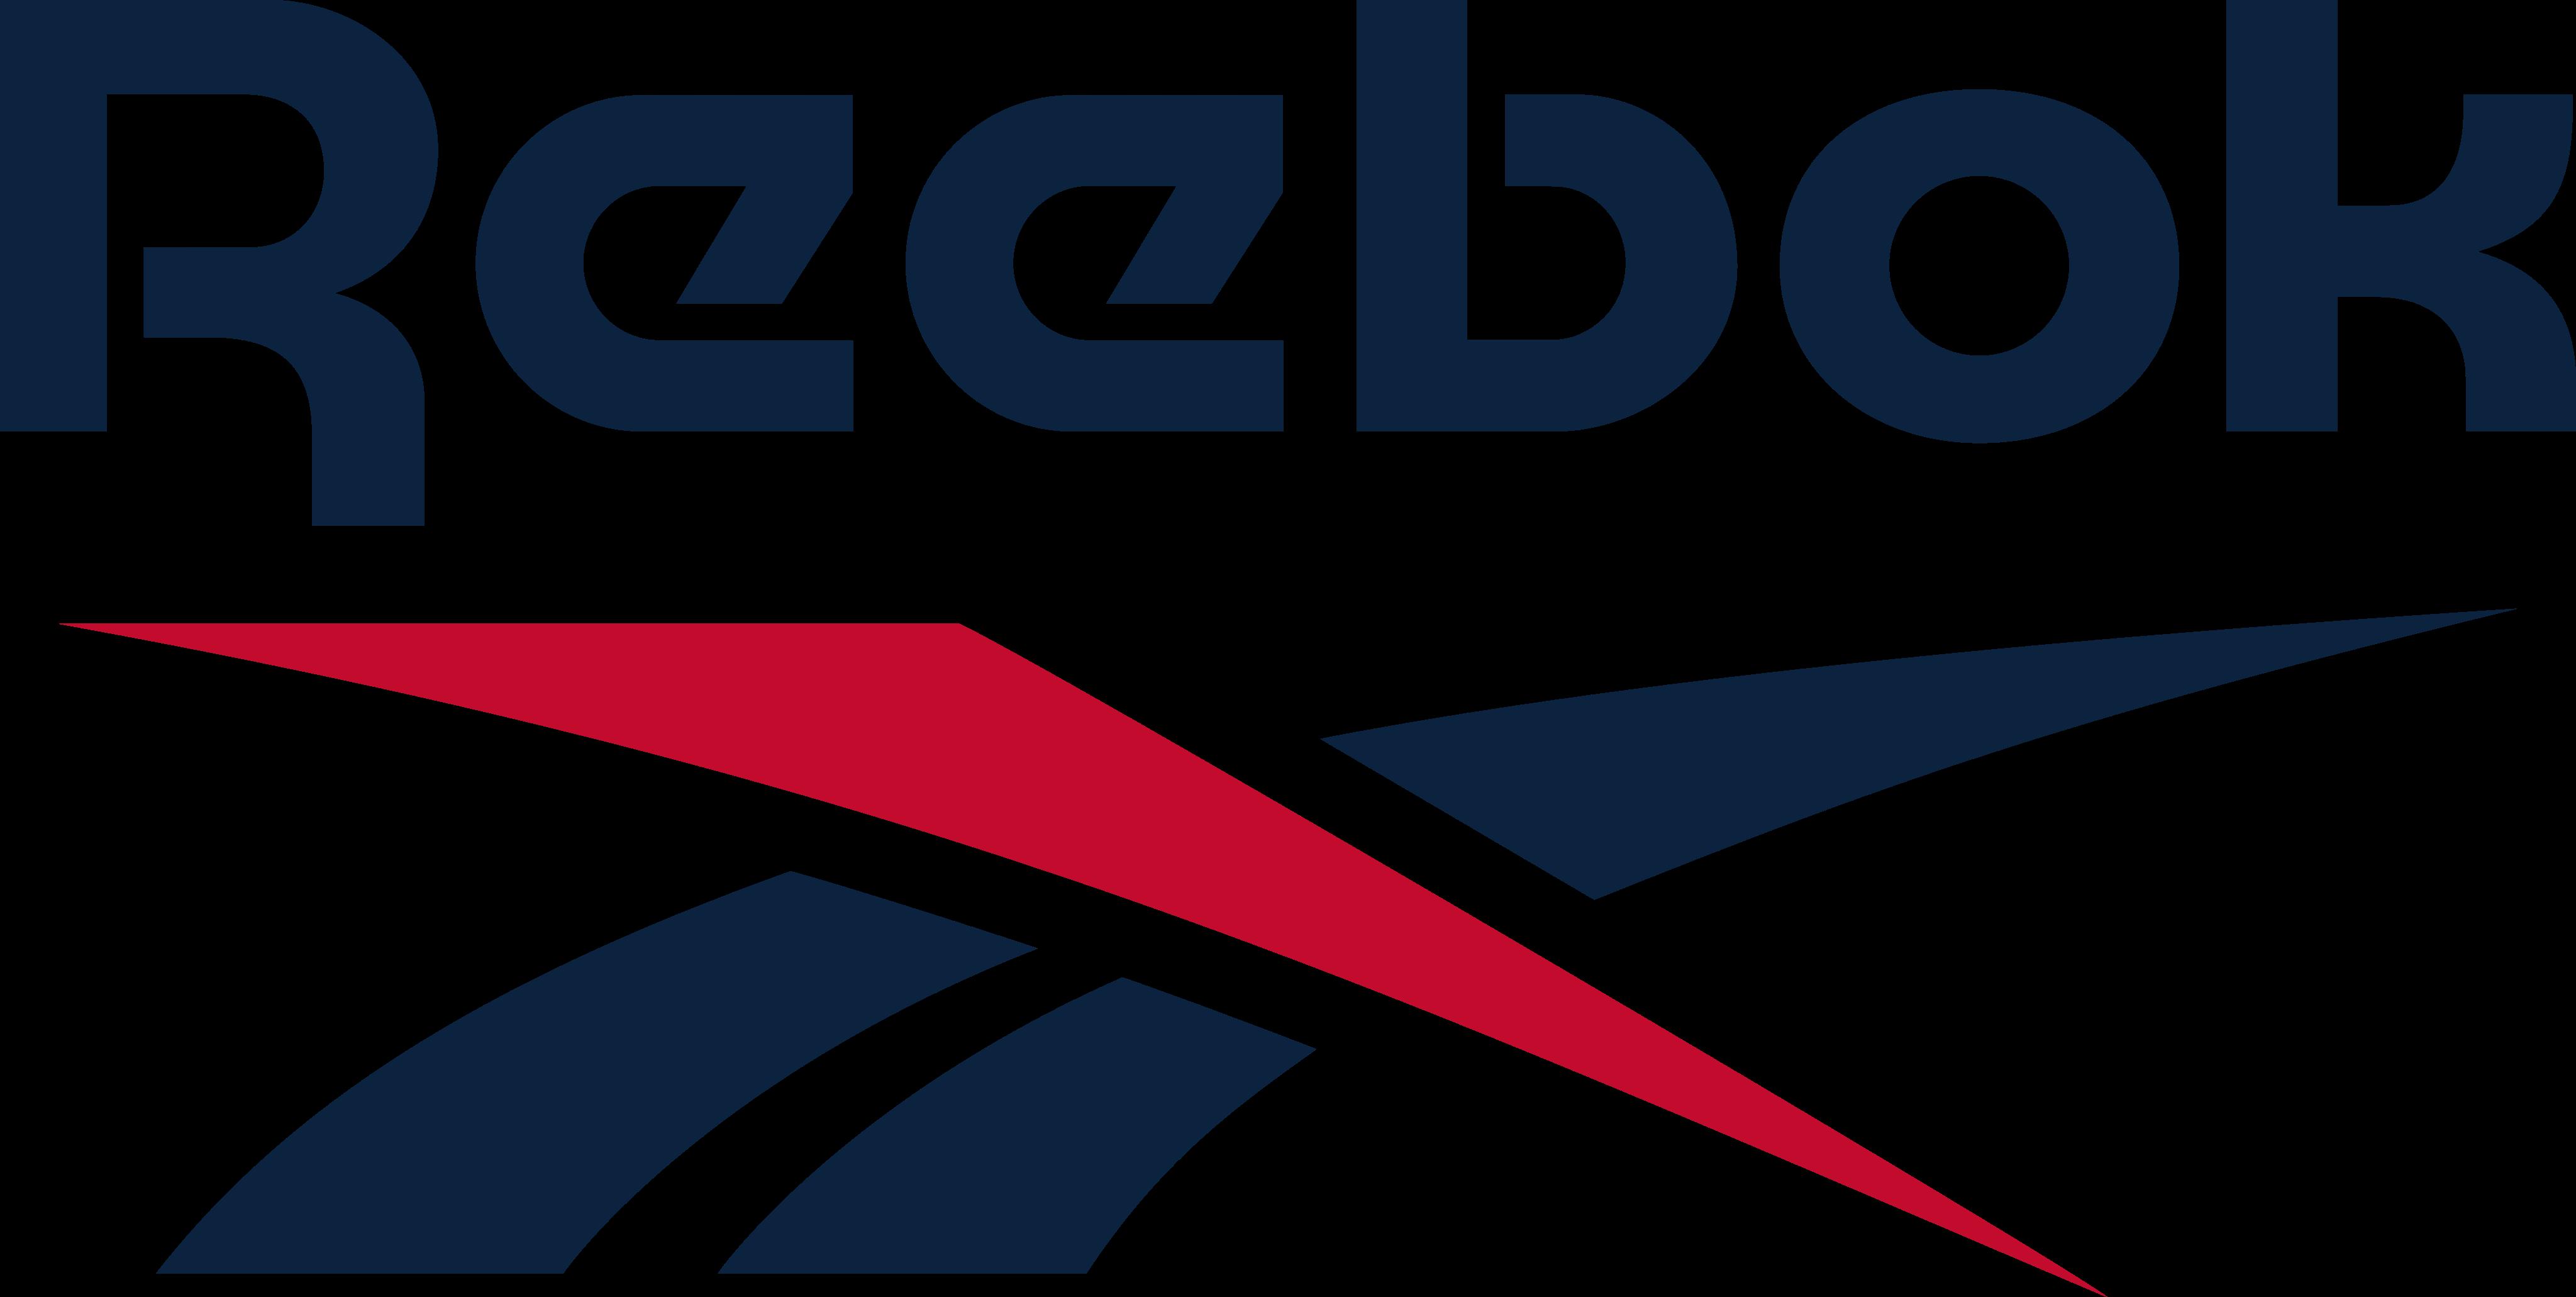 reebok logo 1 - Reebok Logo